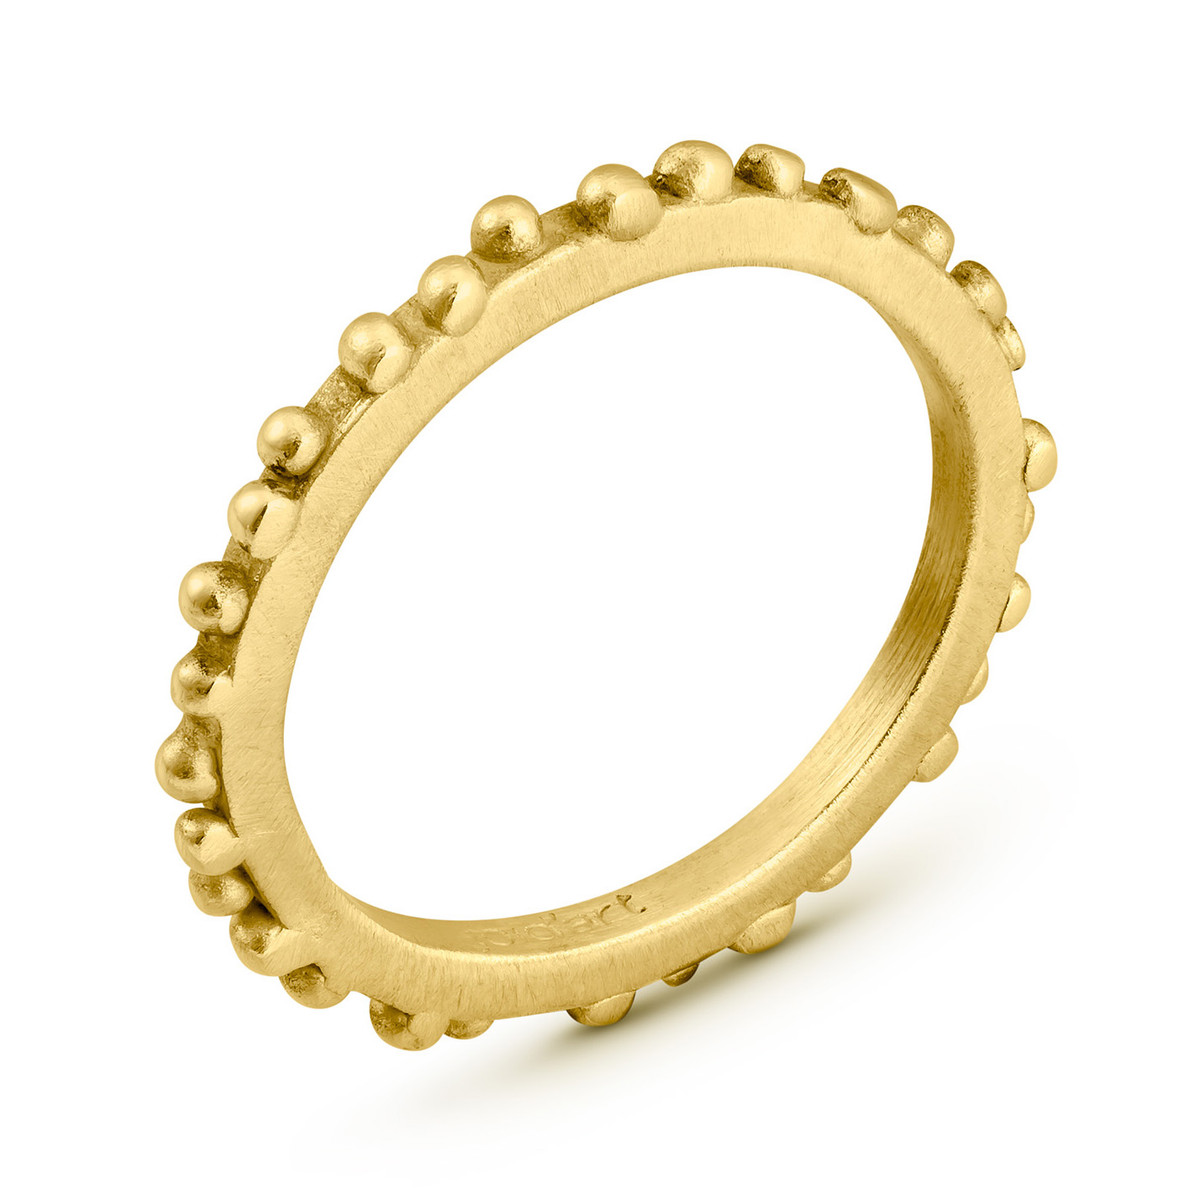 Joidart Constellation Gold Ring Size 8